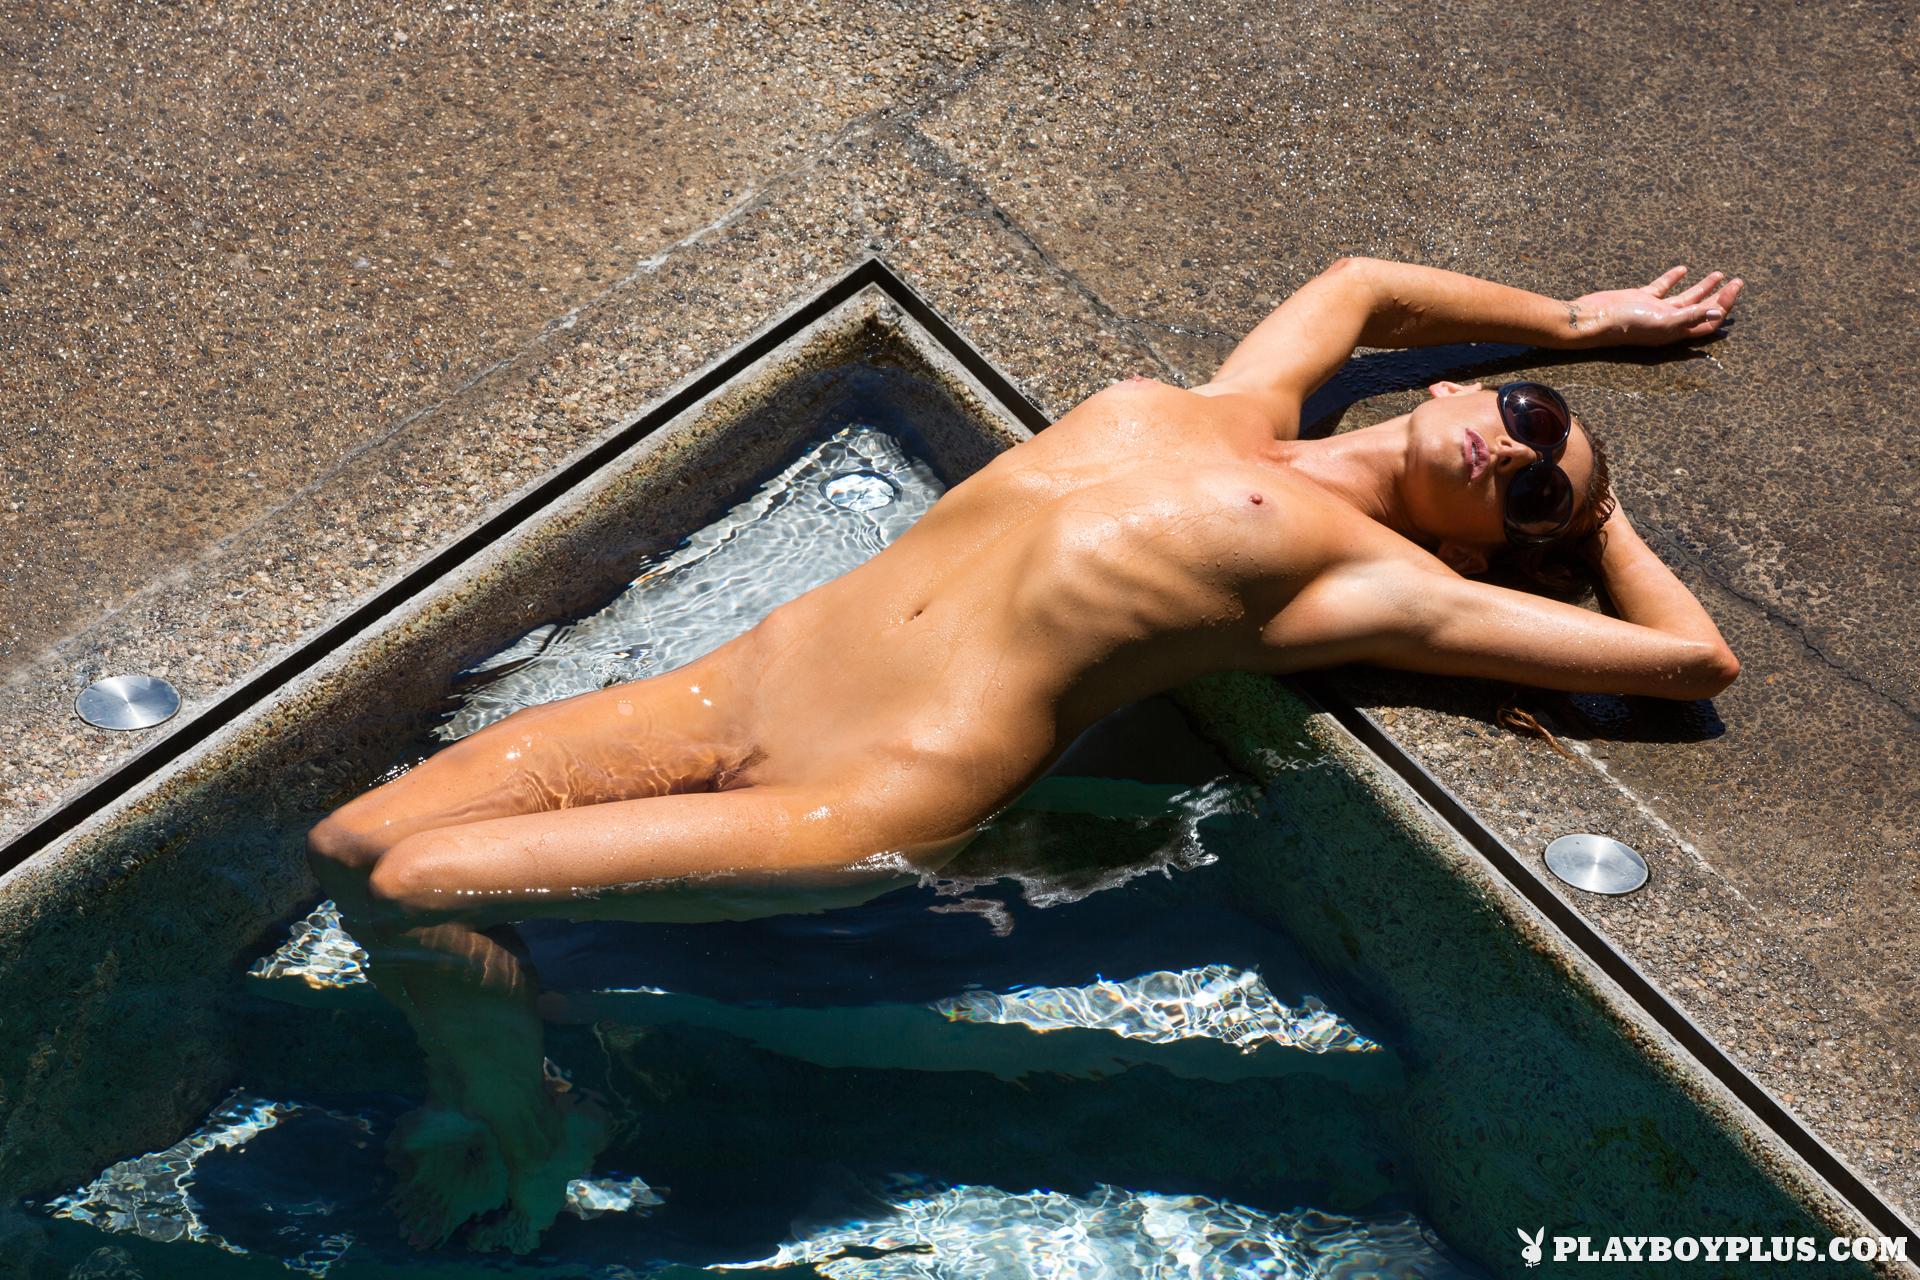 gia-marie-pool-wet-naked-sunglasses-playboy-16